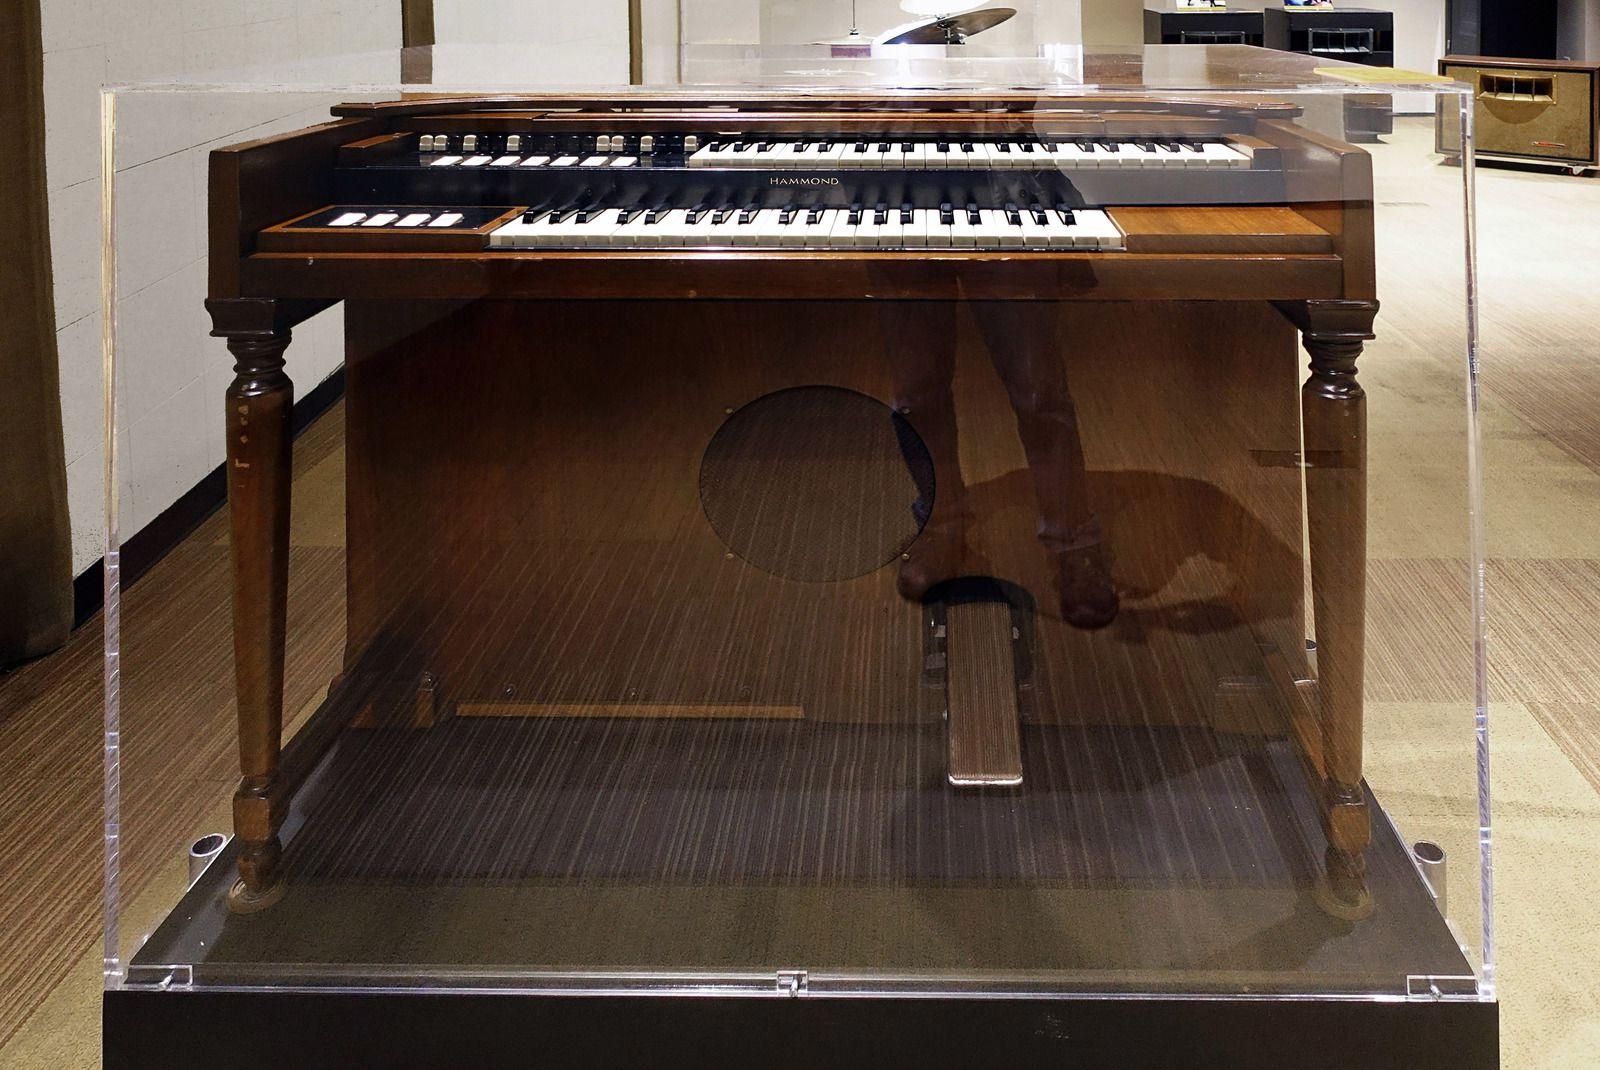 Memphis Stax Museum Orgue Hammond